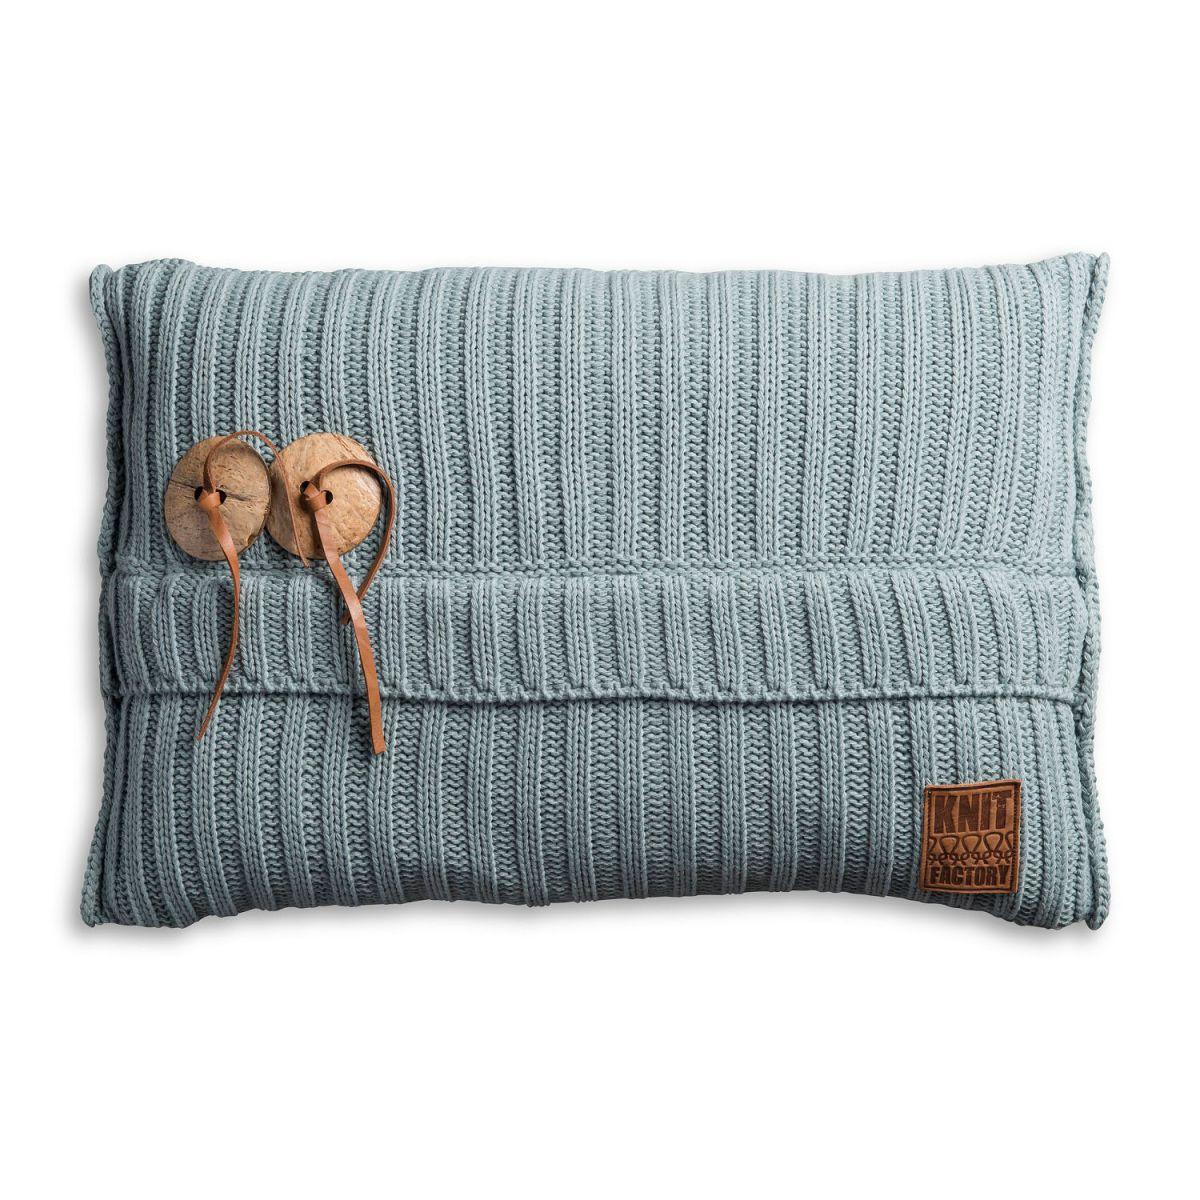 knit factory 1101309 kussen 60x40 aran stone green 1